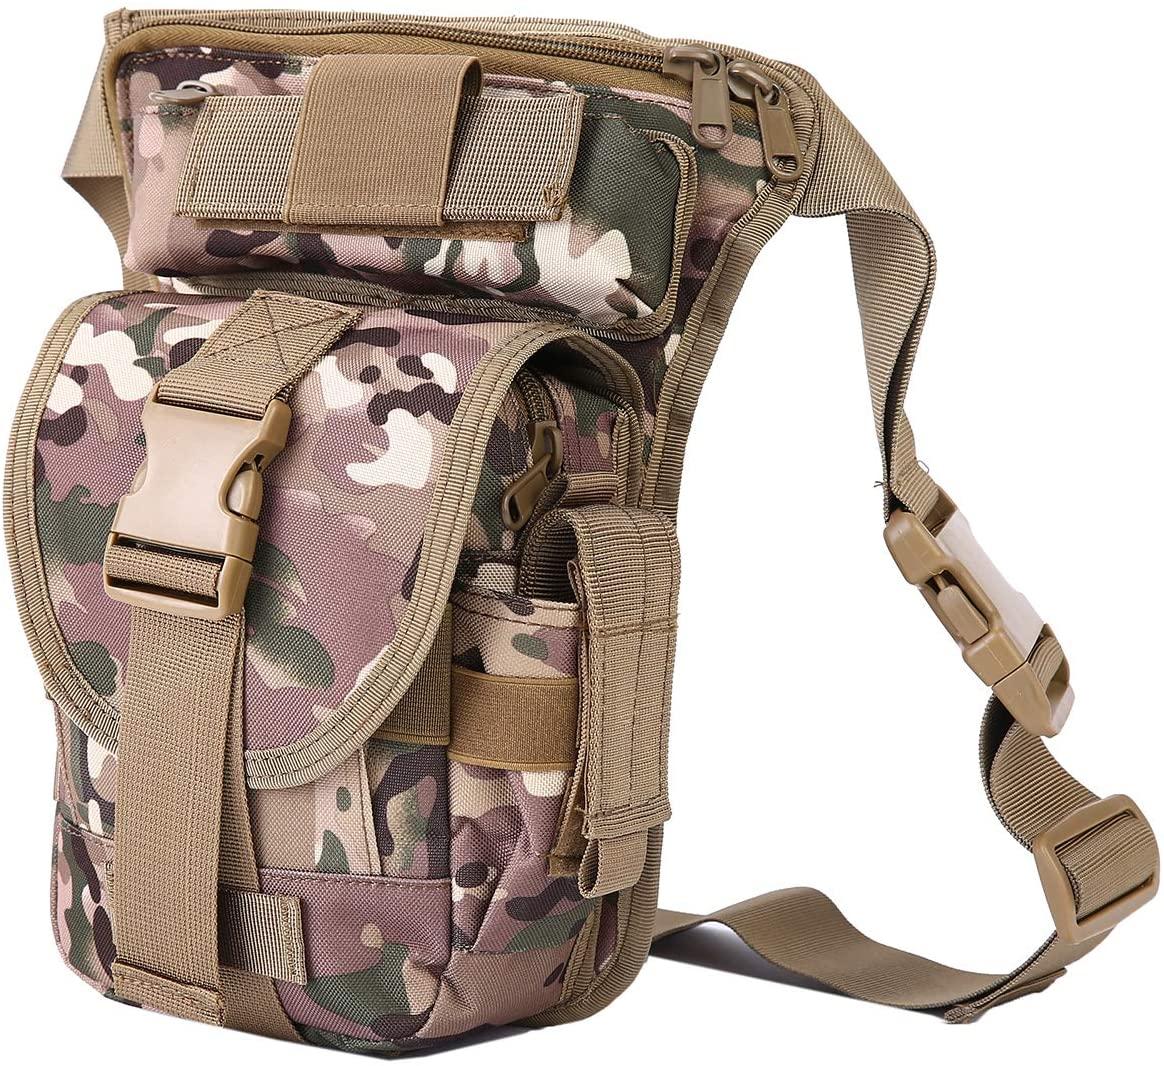 Drop Leg Waist Bag Tactical Military Thigh Waist Fanny Pack Mens (MC)